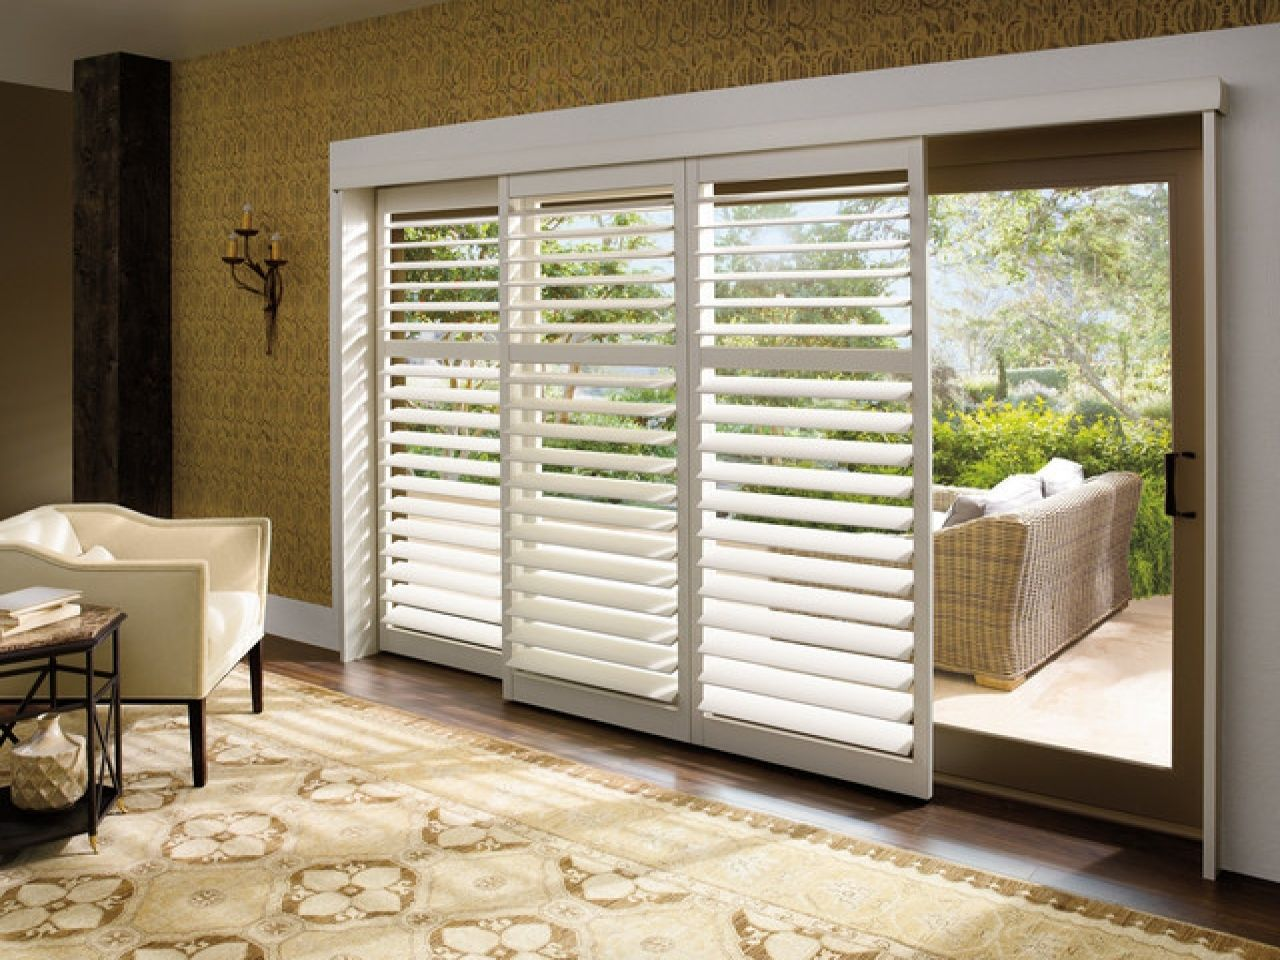 Window covering for patio doors bukuweb pinterest